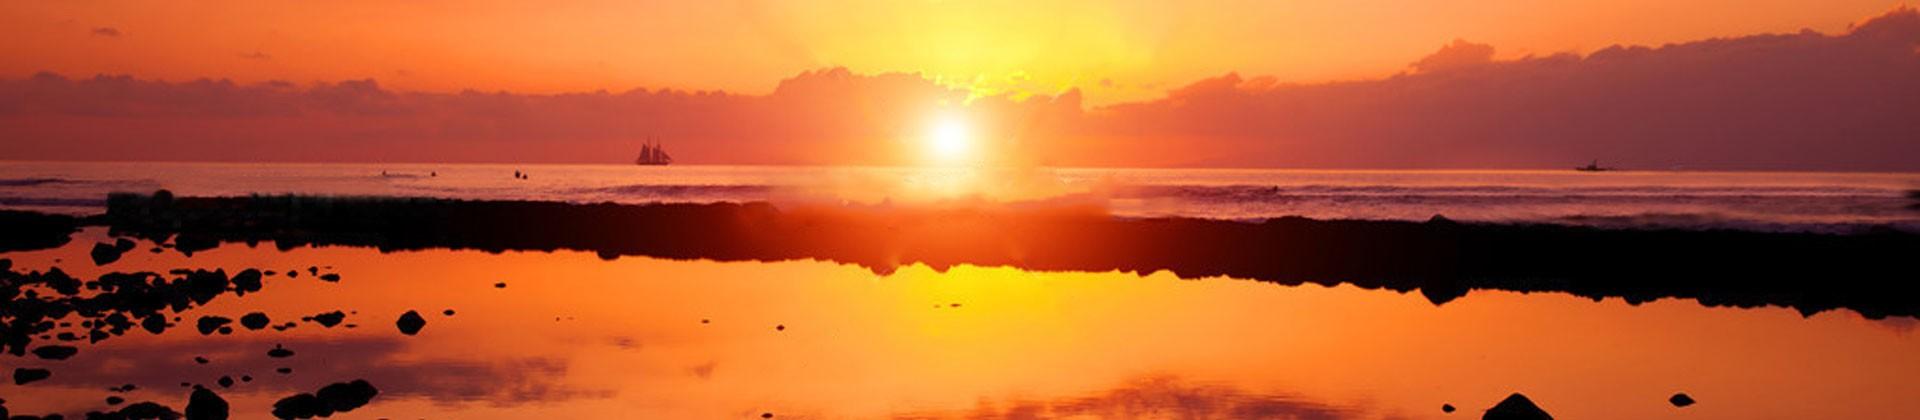 https://www.goodmorningtenerife.com/wp-content/uploads/2014/08/02_slide_sunset_GM_Tenerife-1920x420.jpg